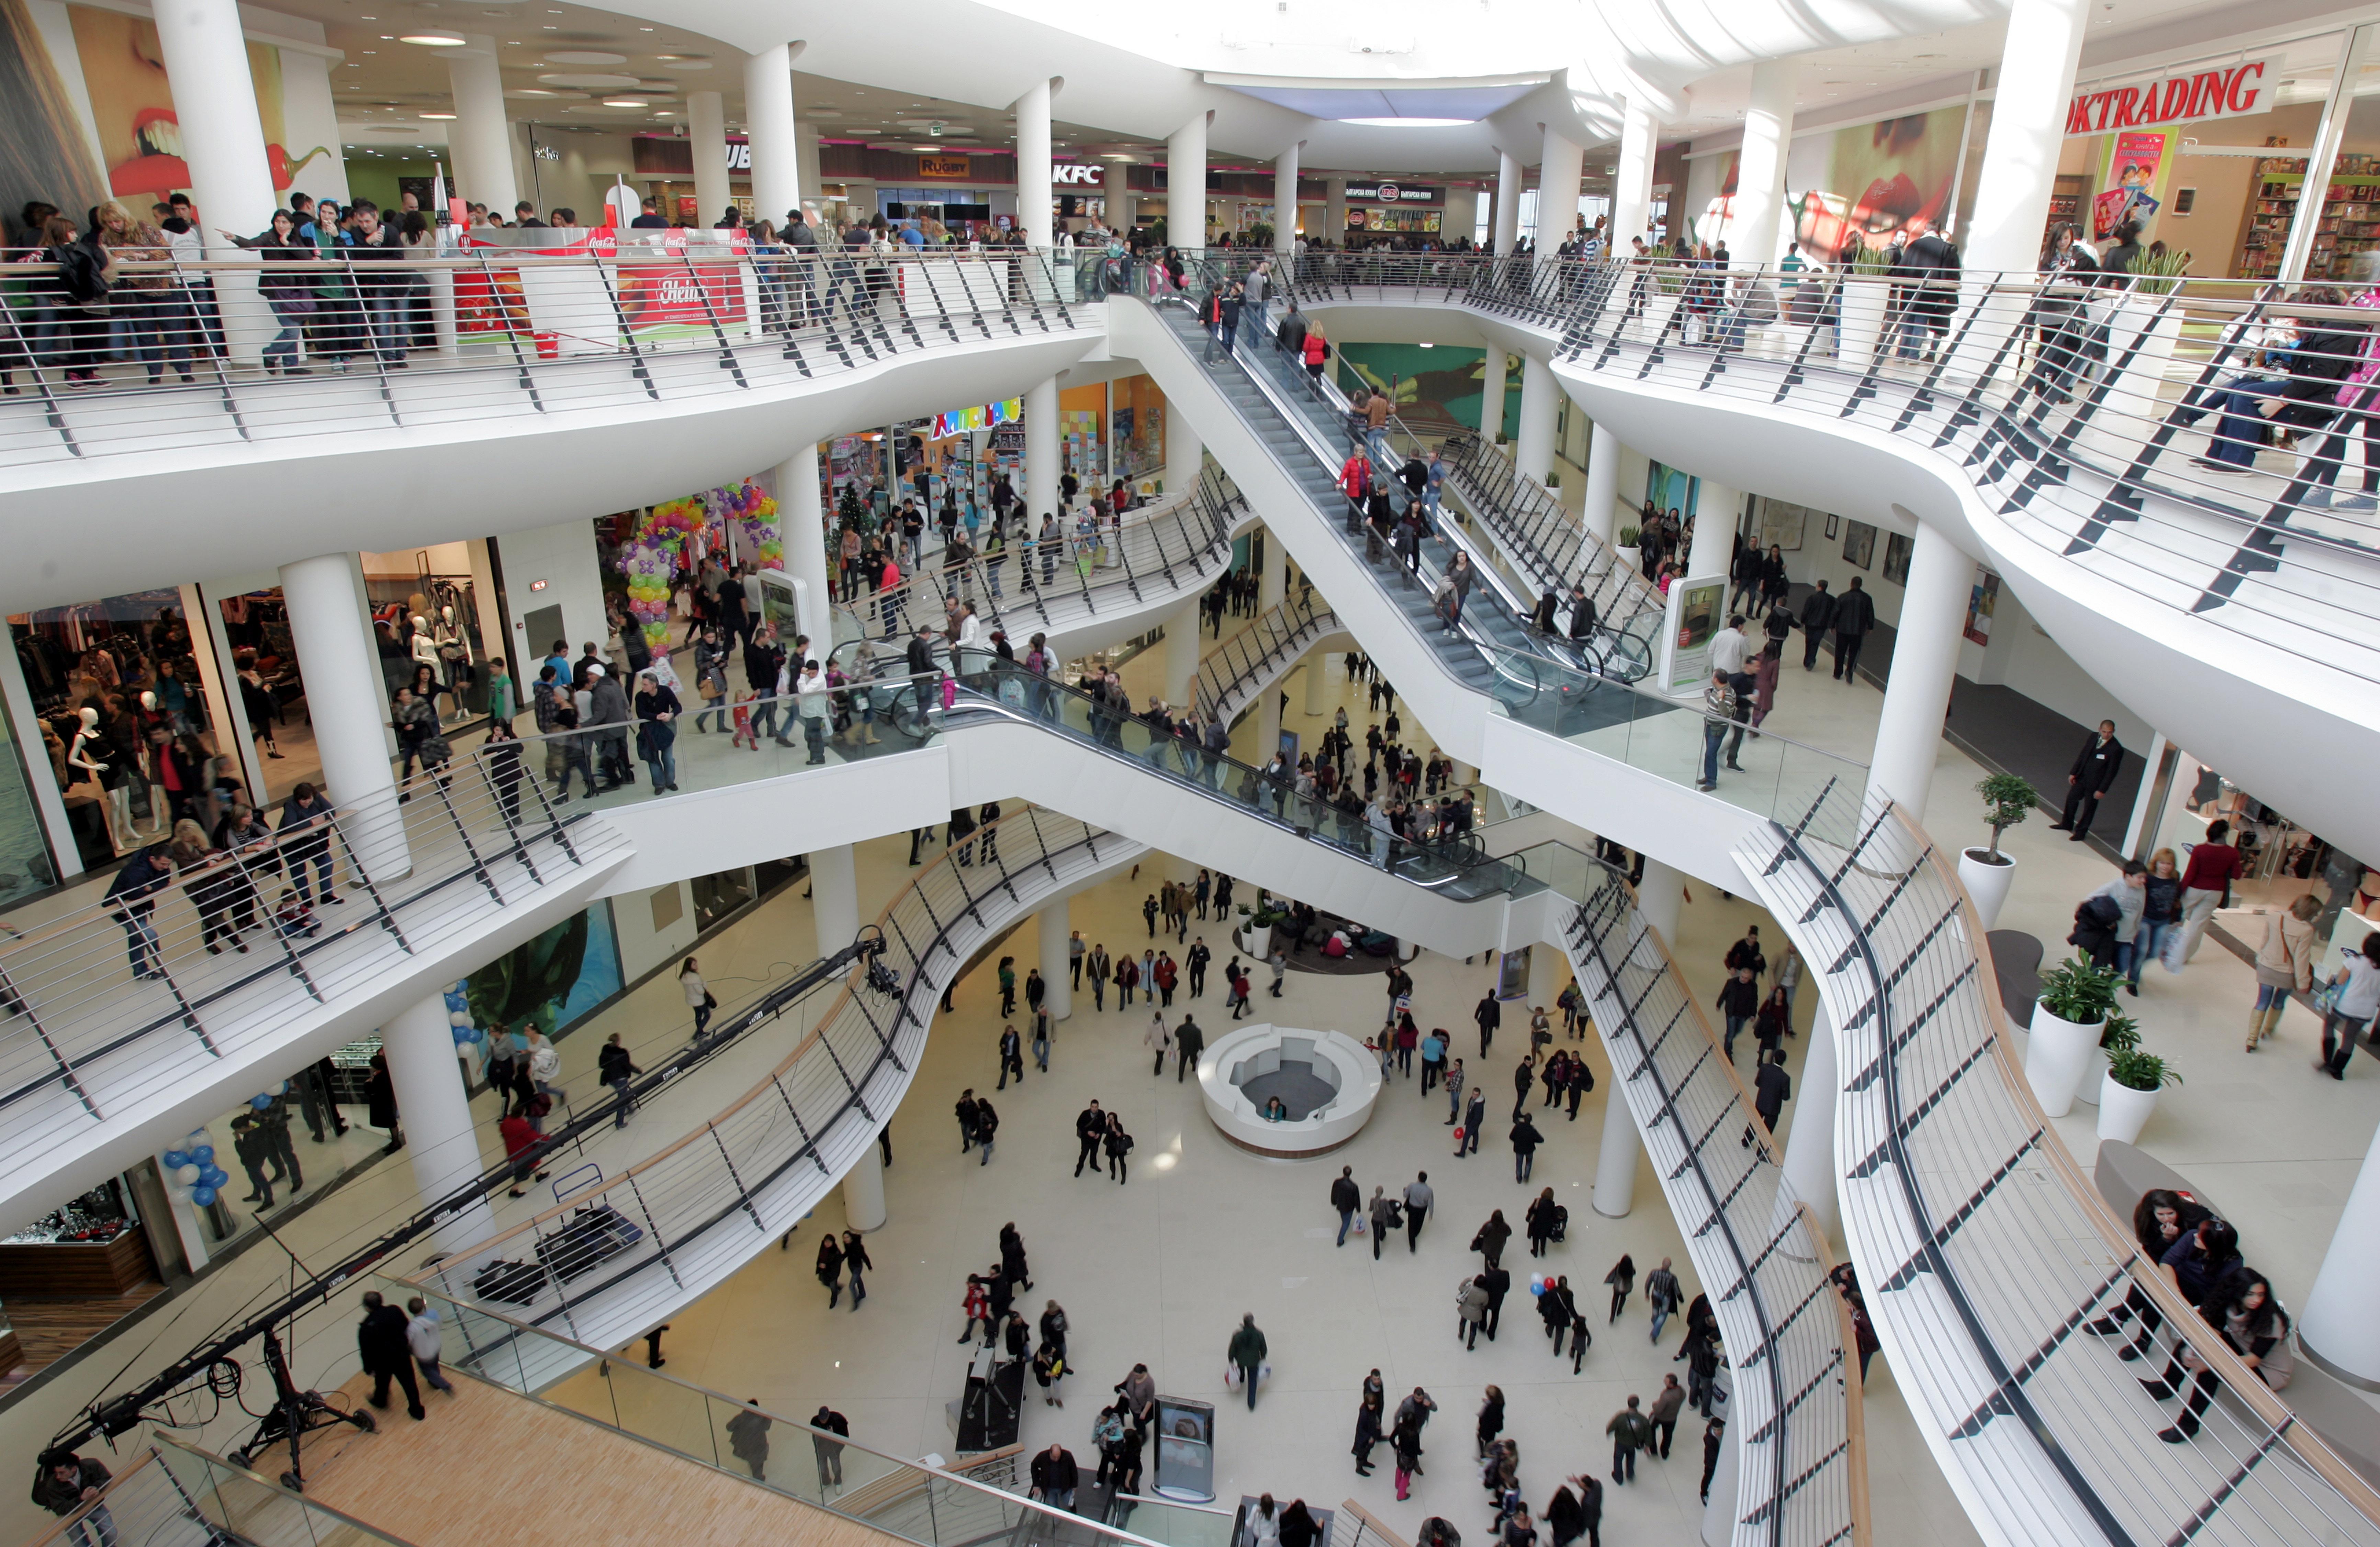 Slovenia's retail sales growth speeds up in 2016